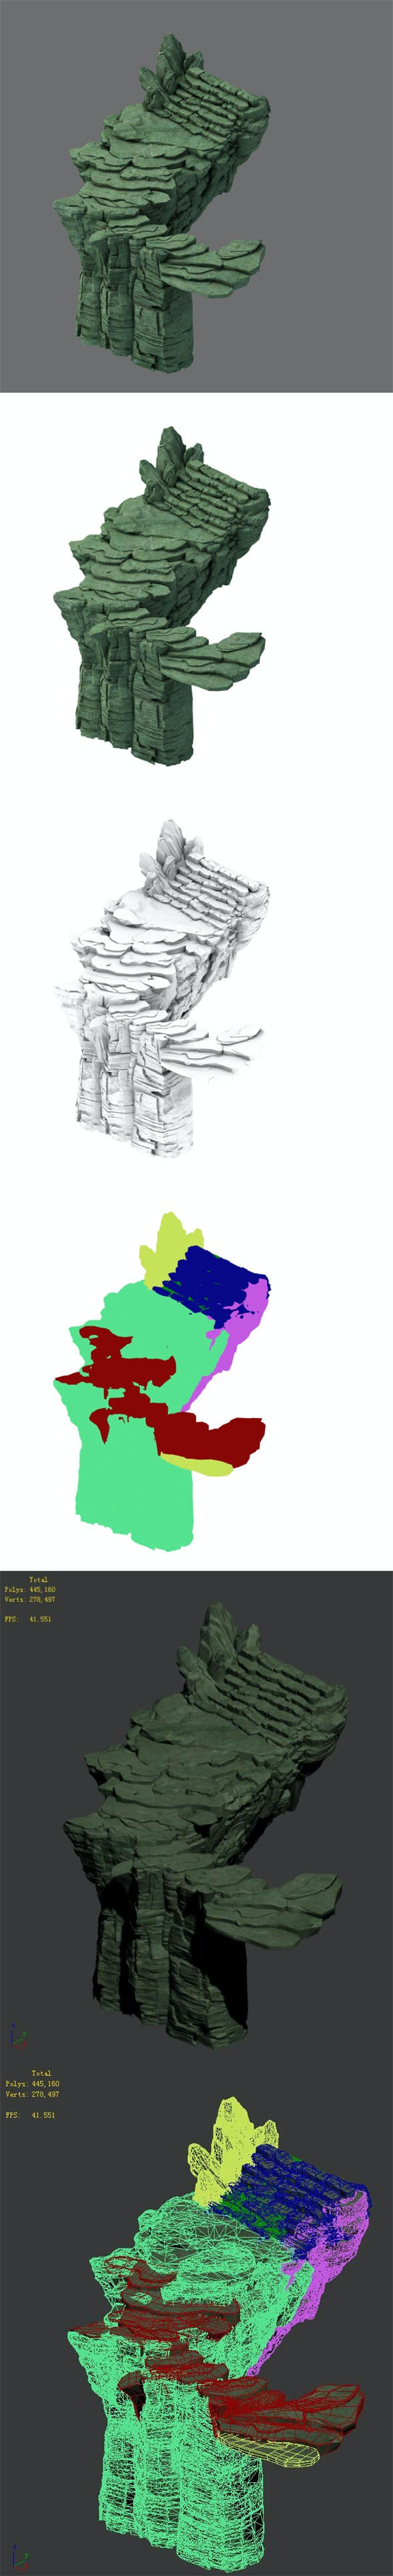 Mountain - terrain stone staircase 02 - 3DOcean Item for Sale